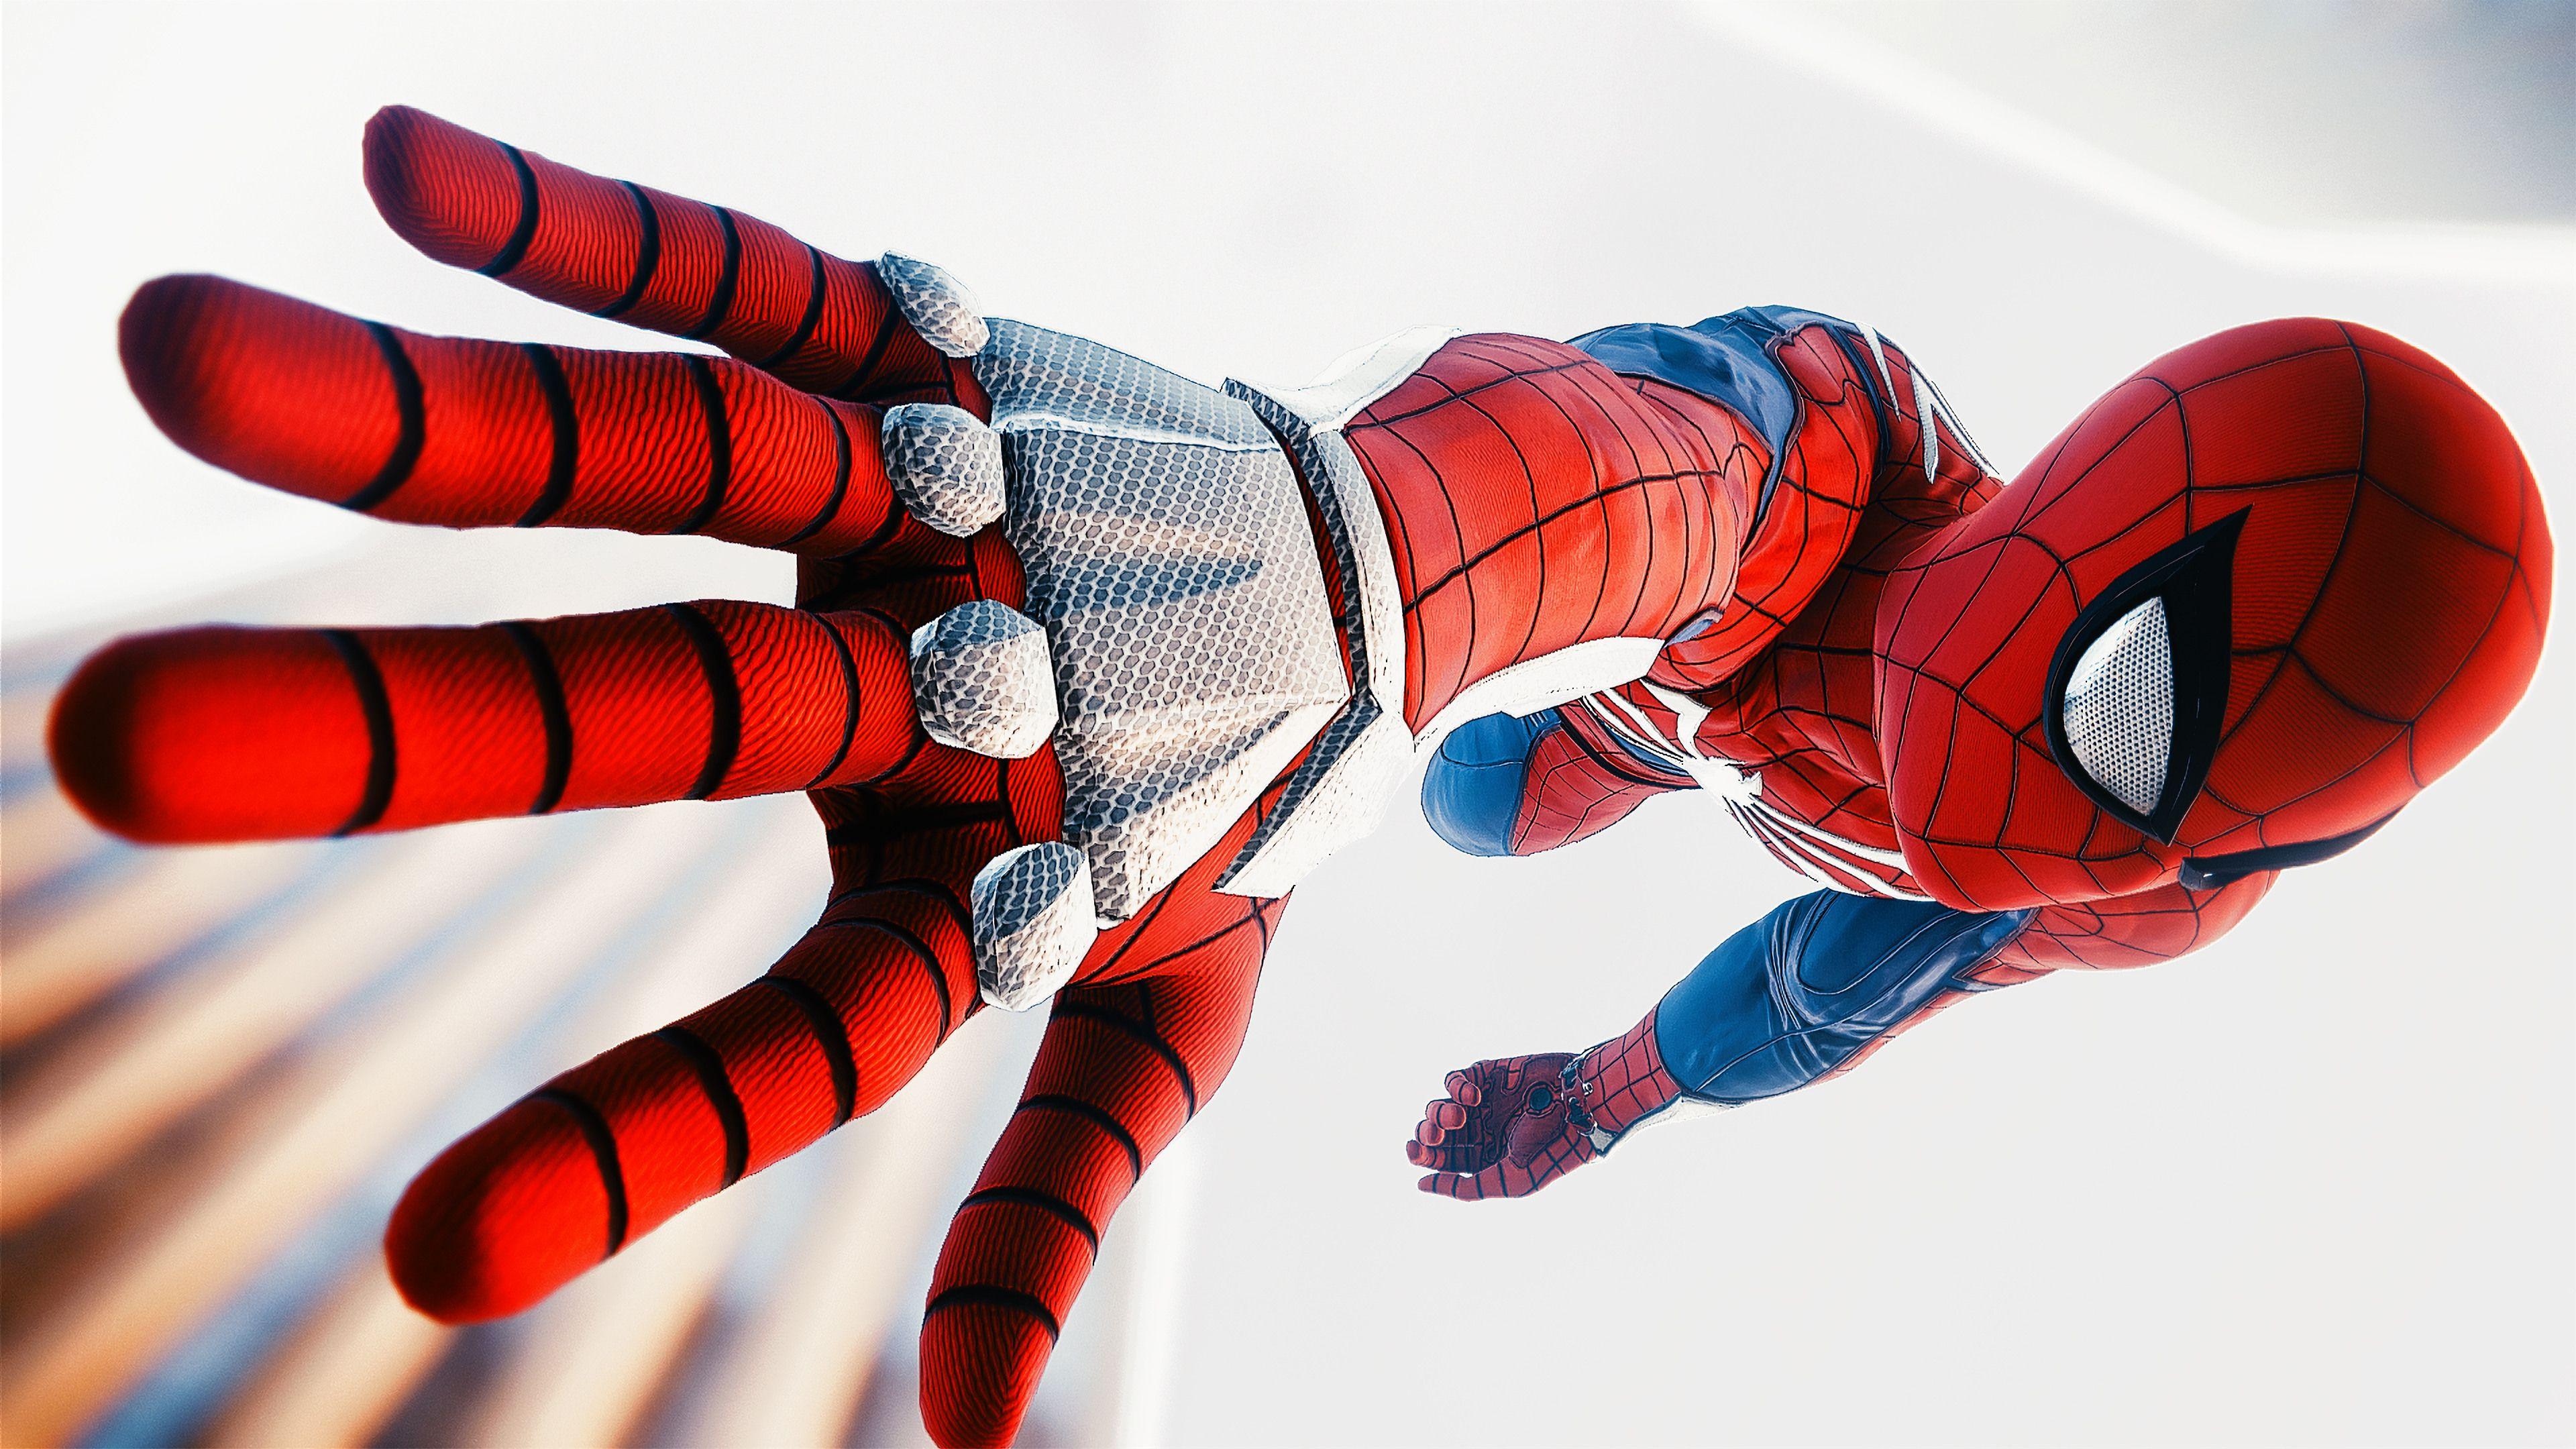 Spiderman Ps4 Advanced Suit 4k Superheroes Wallpapers Spiderman Wallpapers Spiderman Ps4 Wallpapers Ps Spiderman Spiderman Ps4 Wallpaper Spiderman Pictures